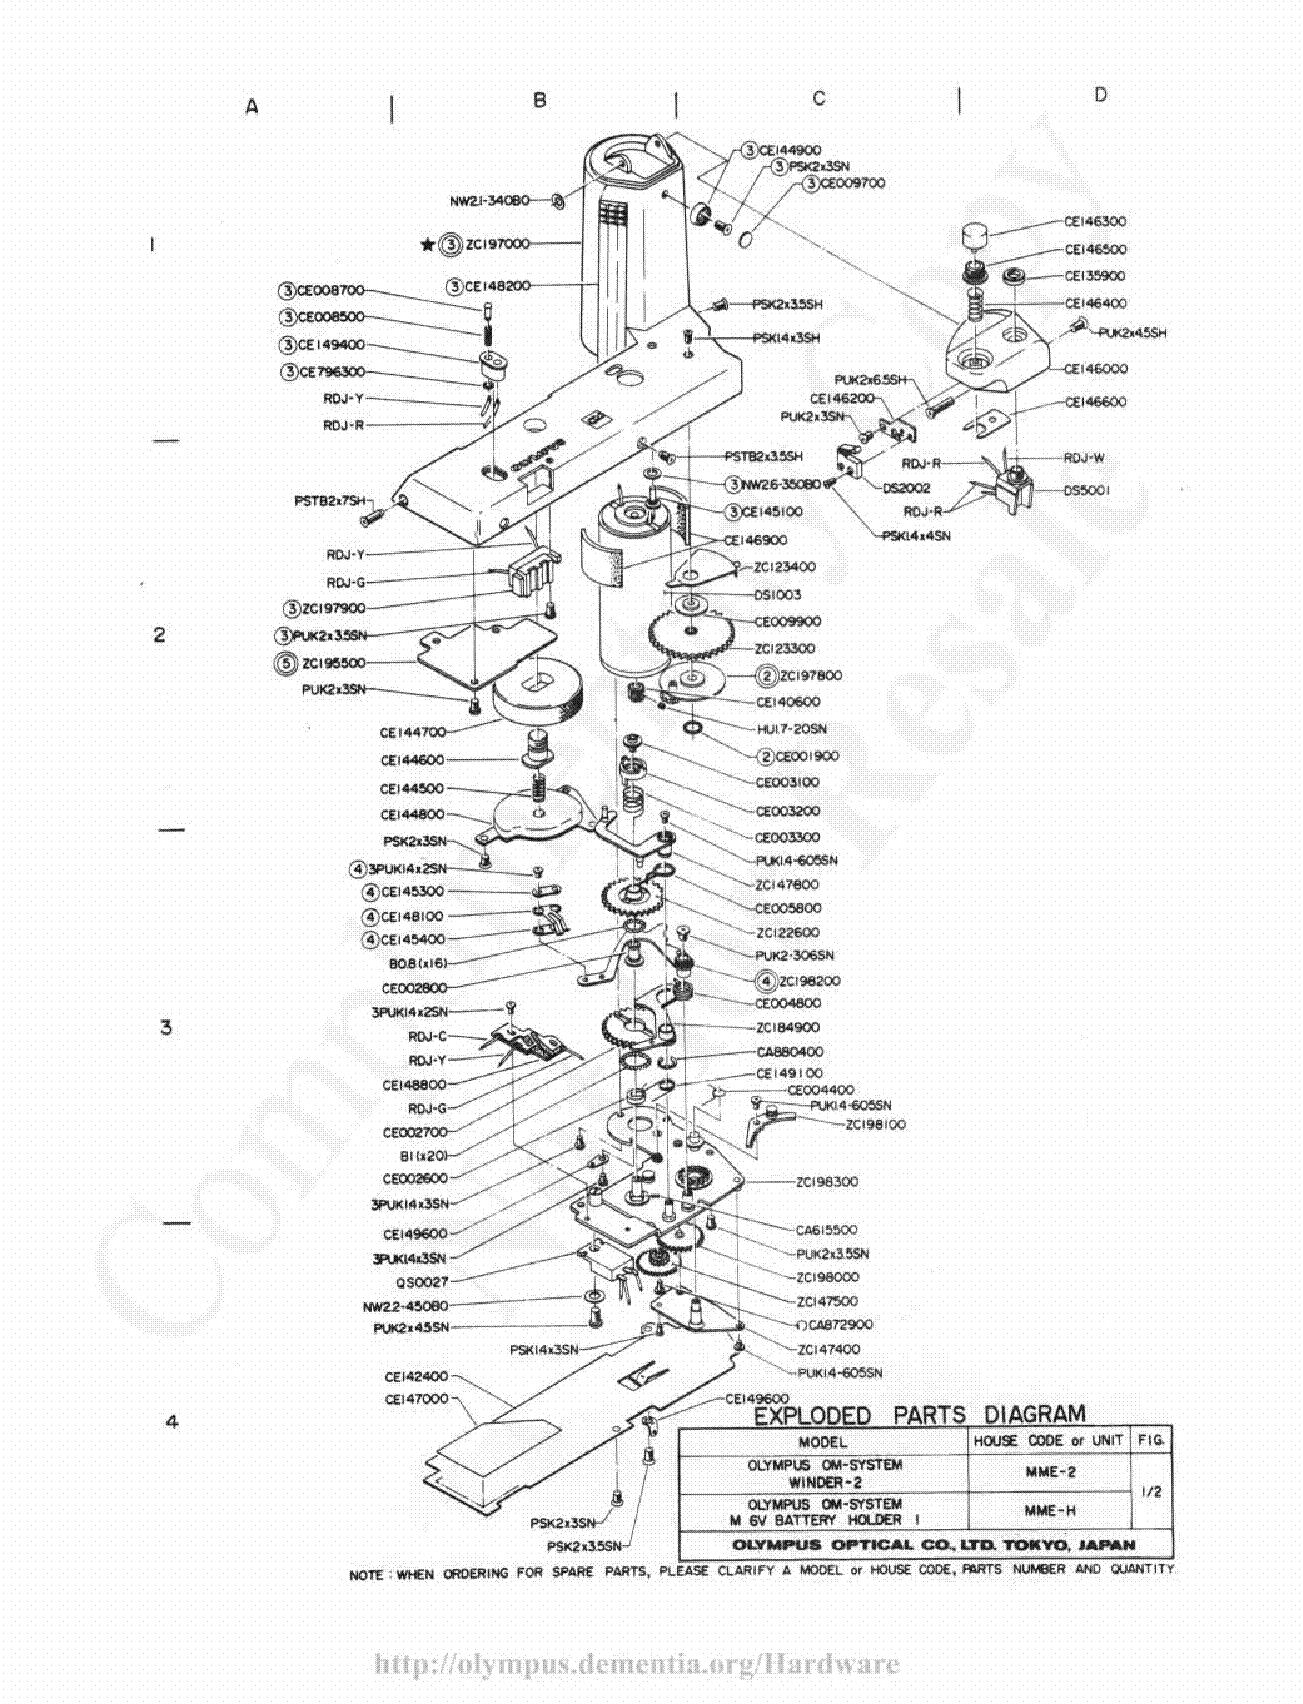 olympus om 2 exploded parts diagram service manual download rh elektrotanya com olympus xa2 owners manual olympus xa2 service manual